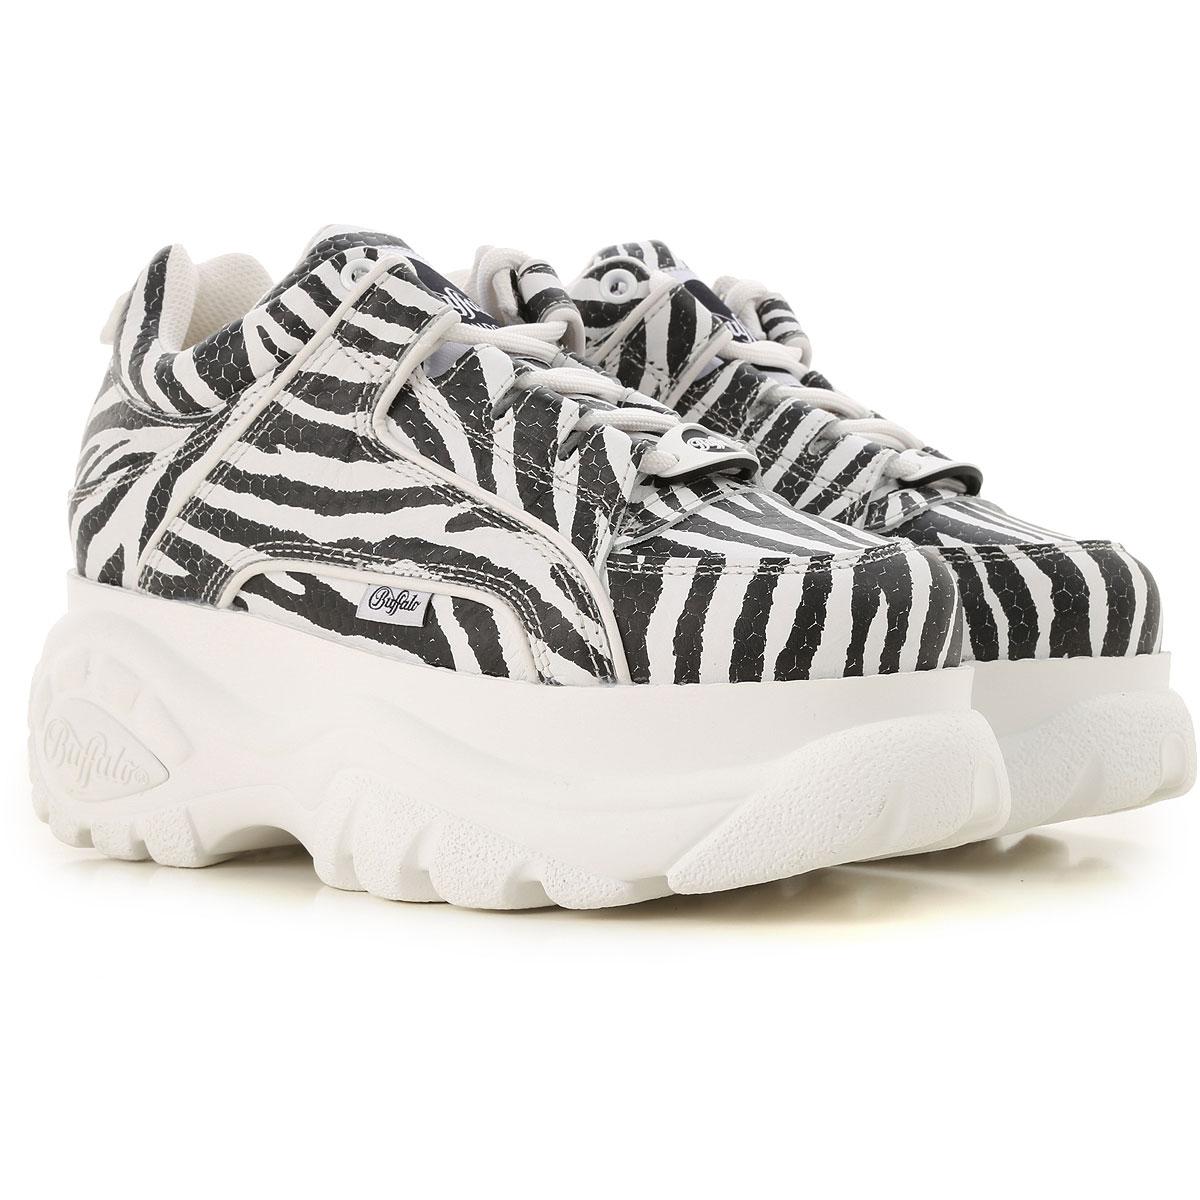 Buffalo Sneakers for Women On Sale in Outlet, Black, Leather, 2019, UK 4 - EU 37 - US 7 UK 5 - EU 38 - US 8 UK 5.5 - EU 39 - US 8.5 UK 6 - EU 40 - US